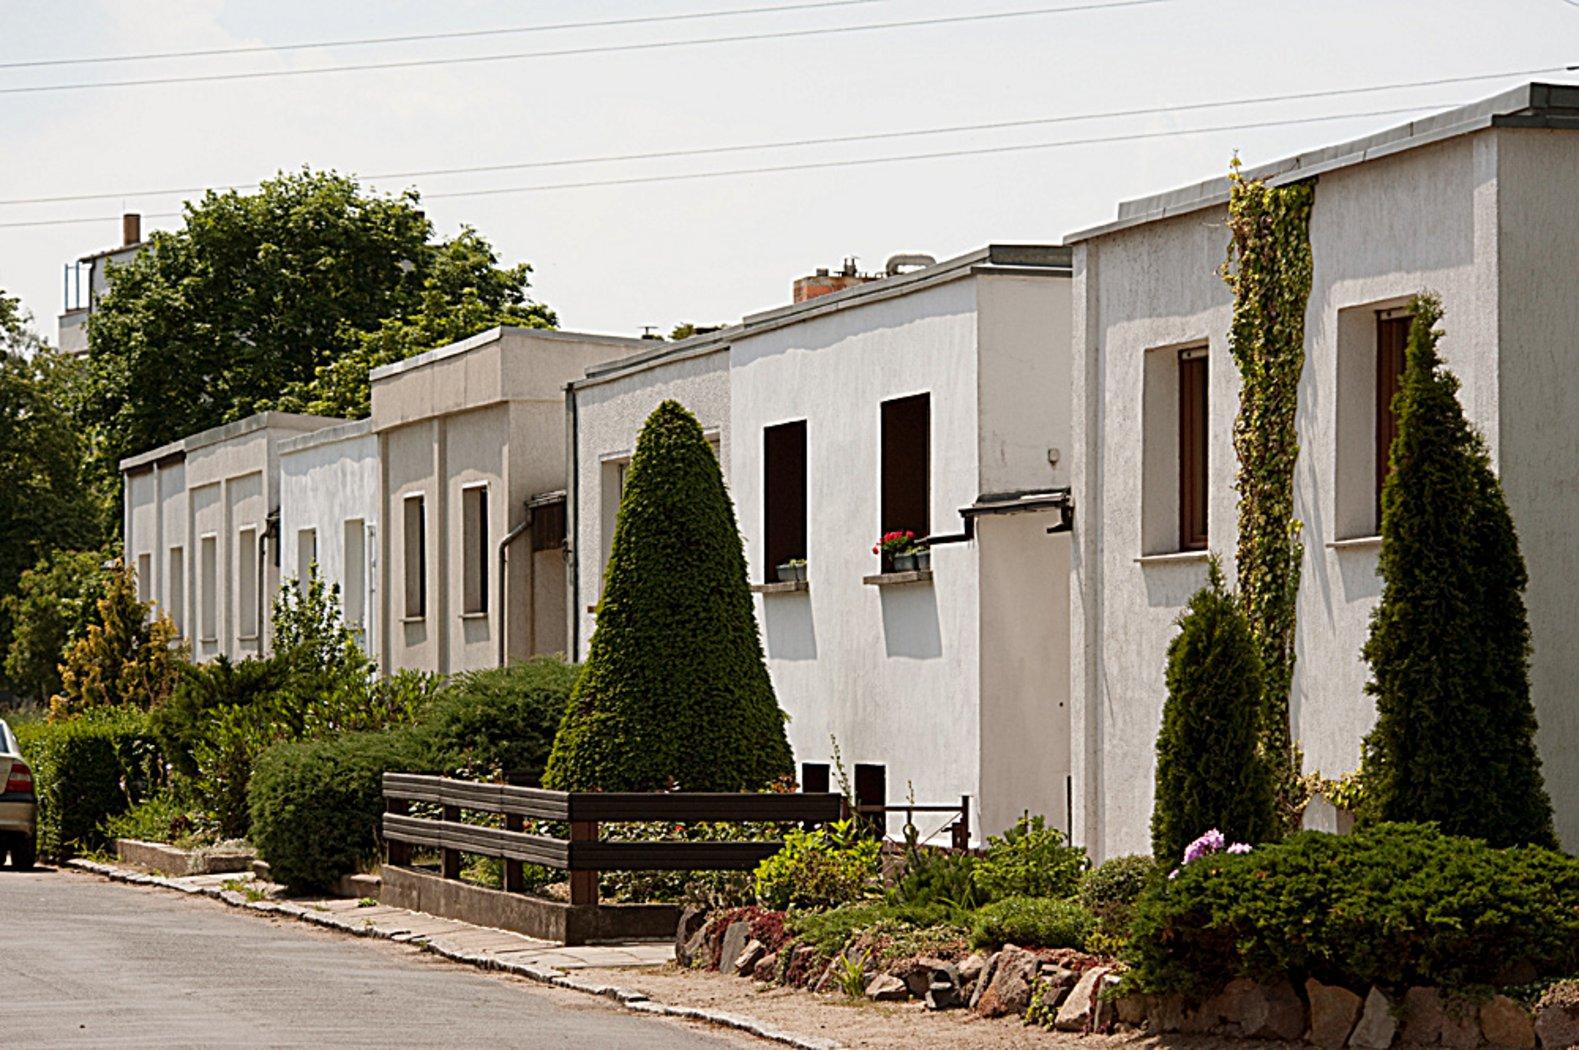 dessau t rten housing estate by walter gropius 1926 28 bauhaus buildings in dessau. Black Bedroom Furniture Sets. Home Design Ideas